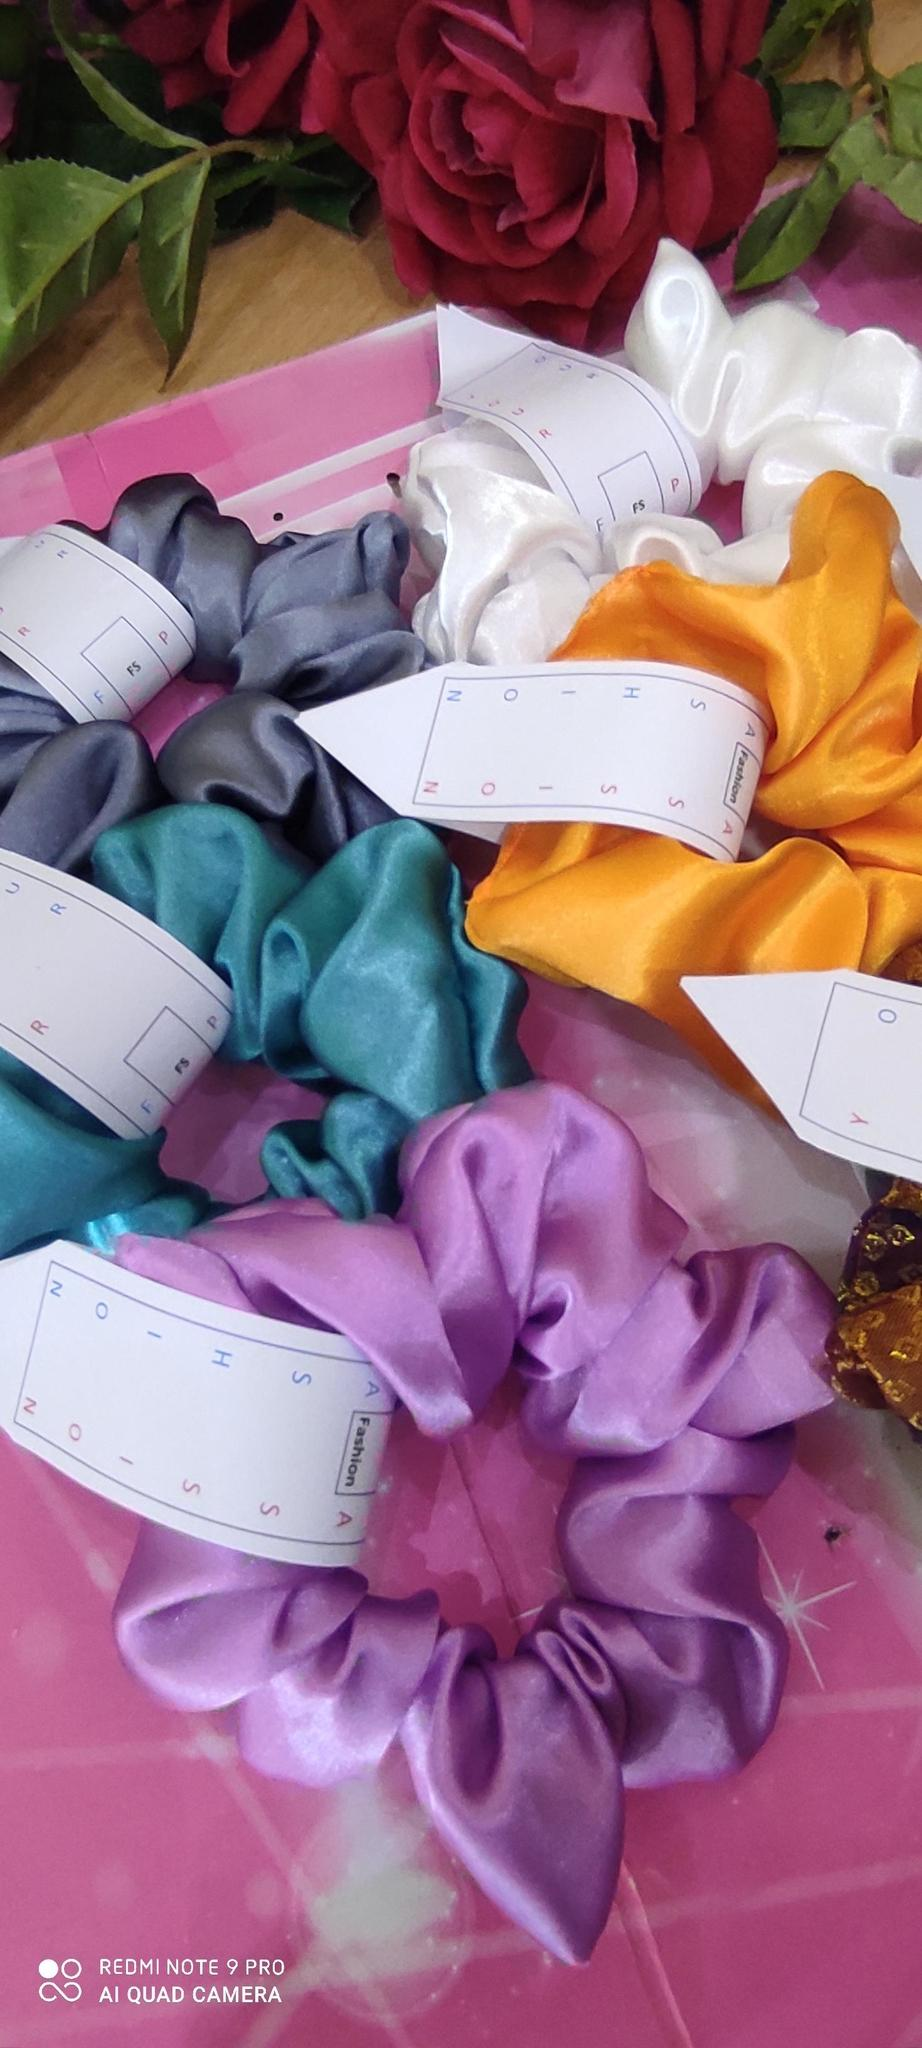 Satin silk scarf and scrunchies